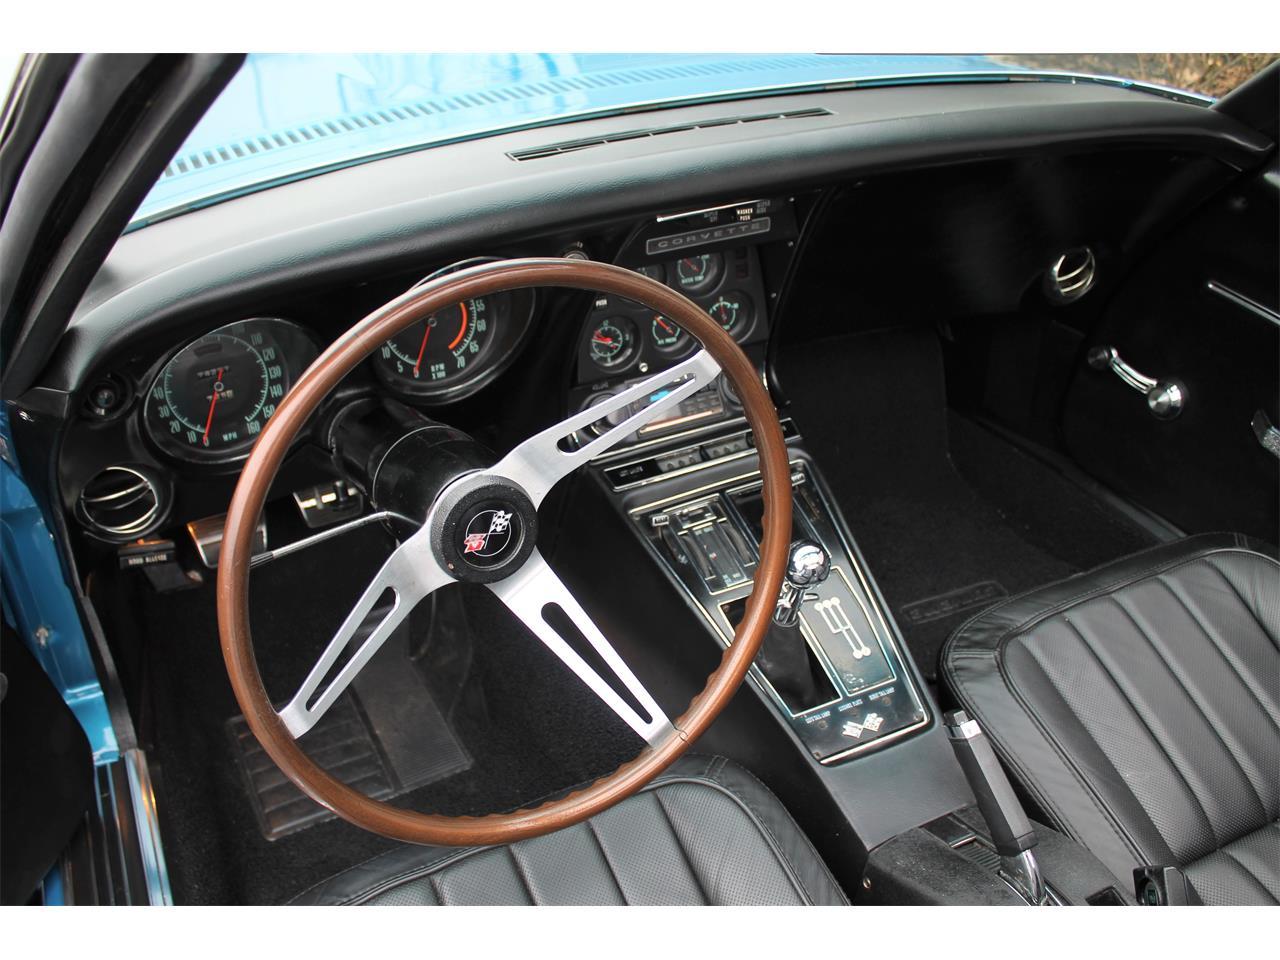 1968 Chevrolet Corvette (CC-1314424) for sale in Allentown, Pennsylvania